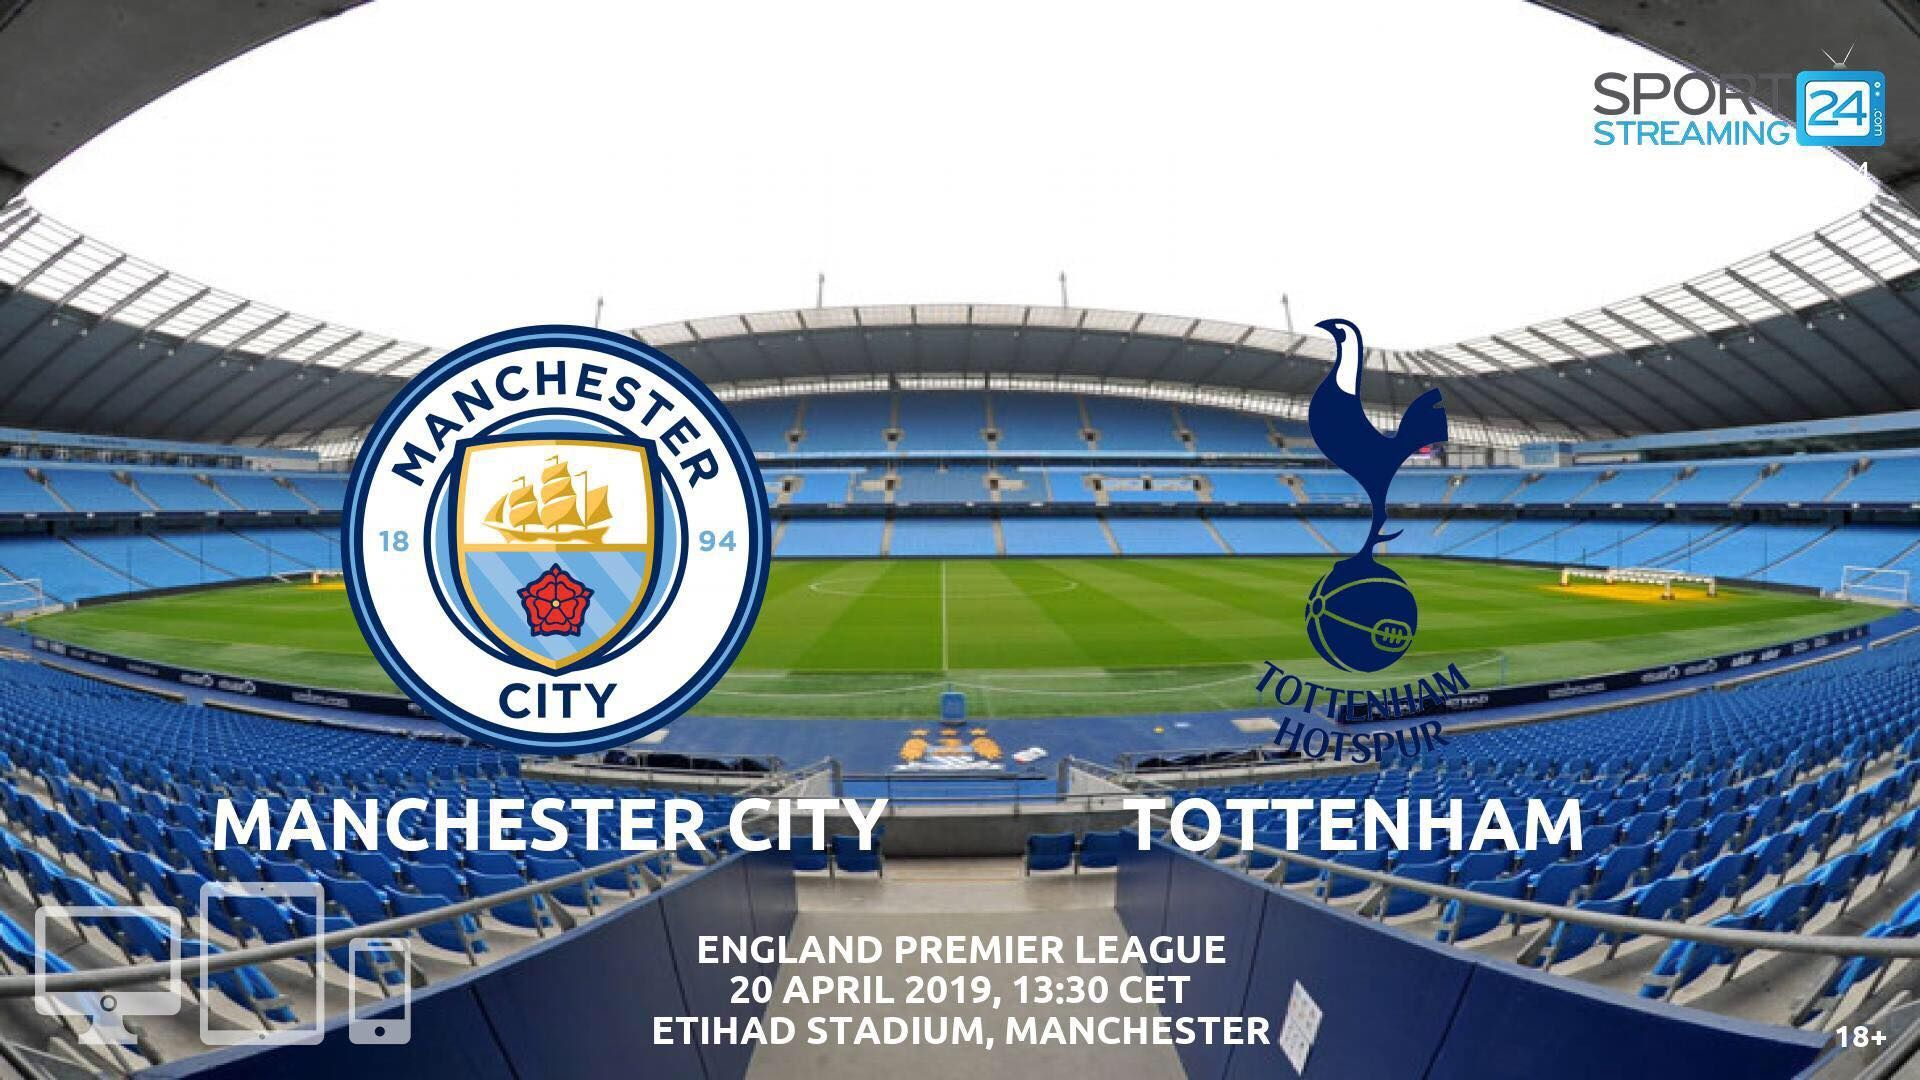 Manchester City v Tottenham Live Stream Betting Odds (With